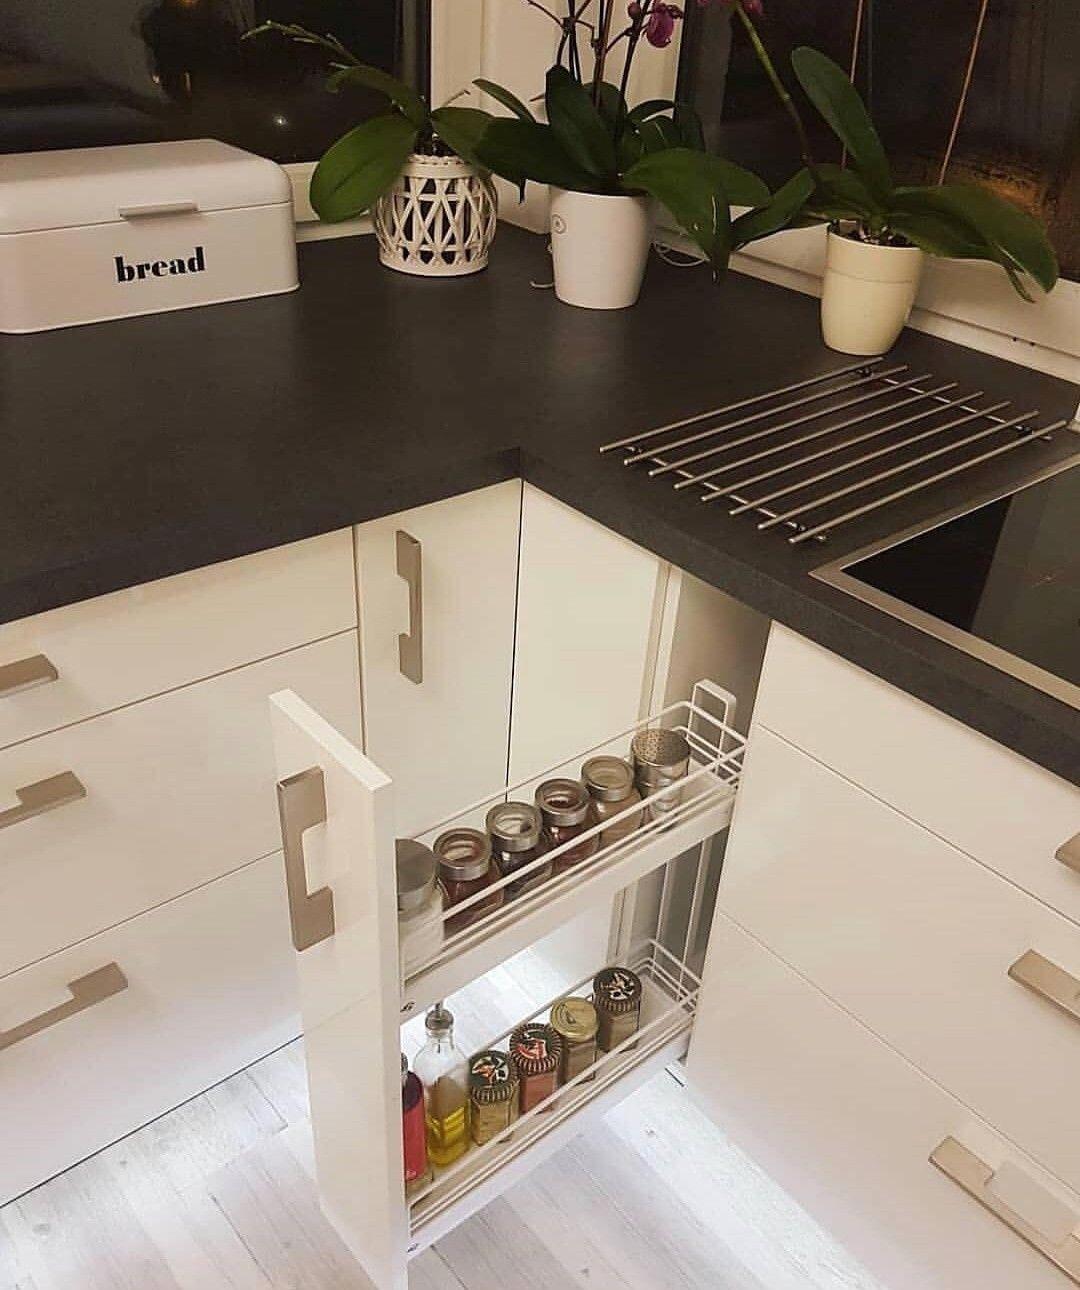 اثاث اثاث مودرن اثاث ايكيا أثاث منزلي اثاثكم ديكورات خارجية ديكورات ديكور Kitchen Furniture Design Kitchen Design Plans Luxury Kitchen Cabinets